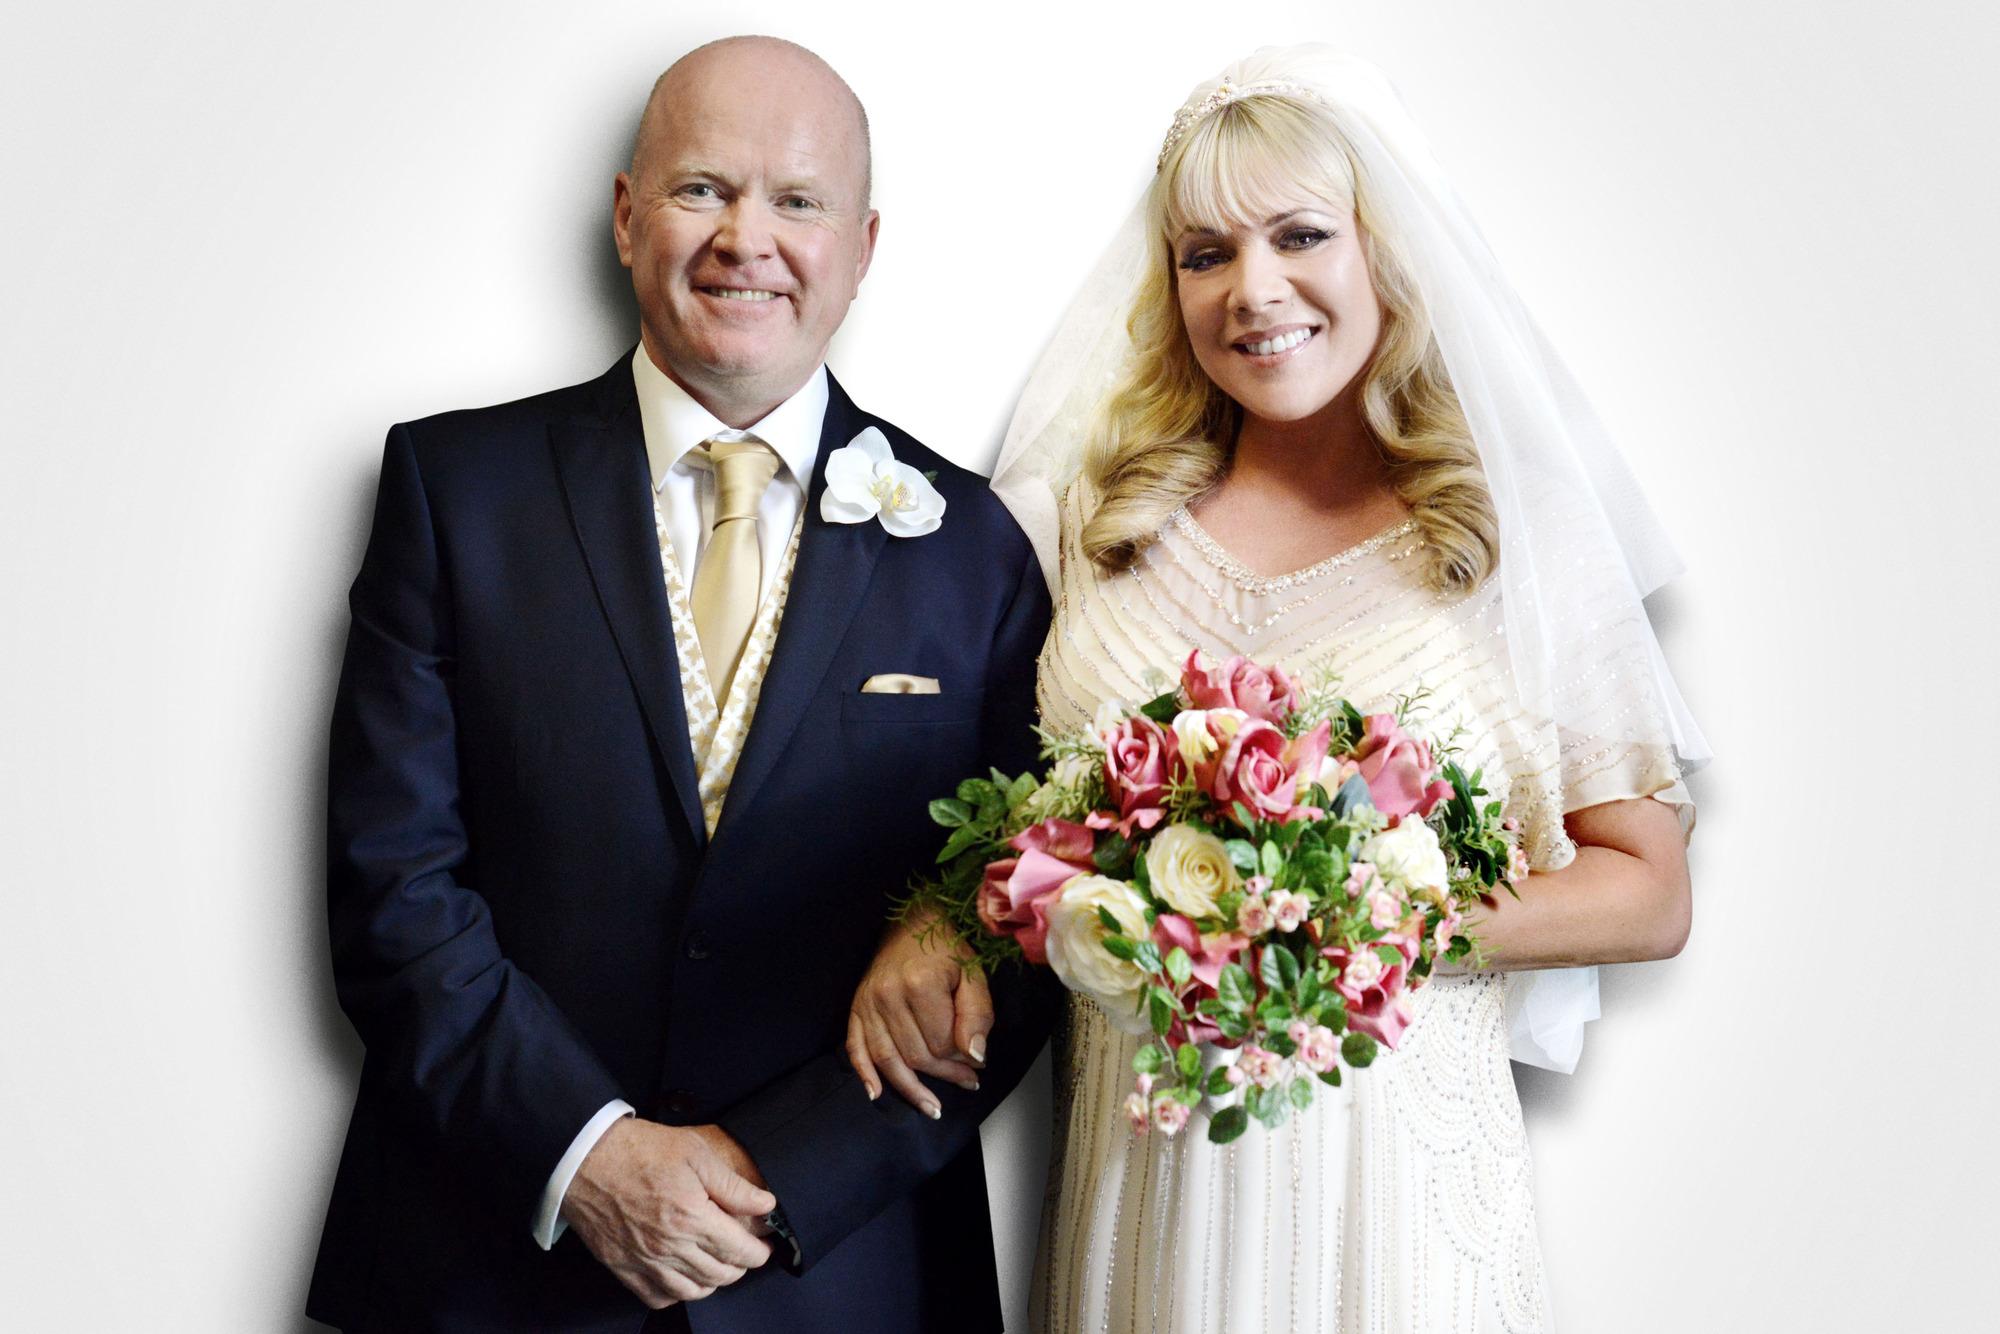 EastEnders: 5 reasons Phil and Sharon's wedding is doomed